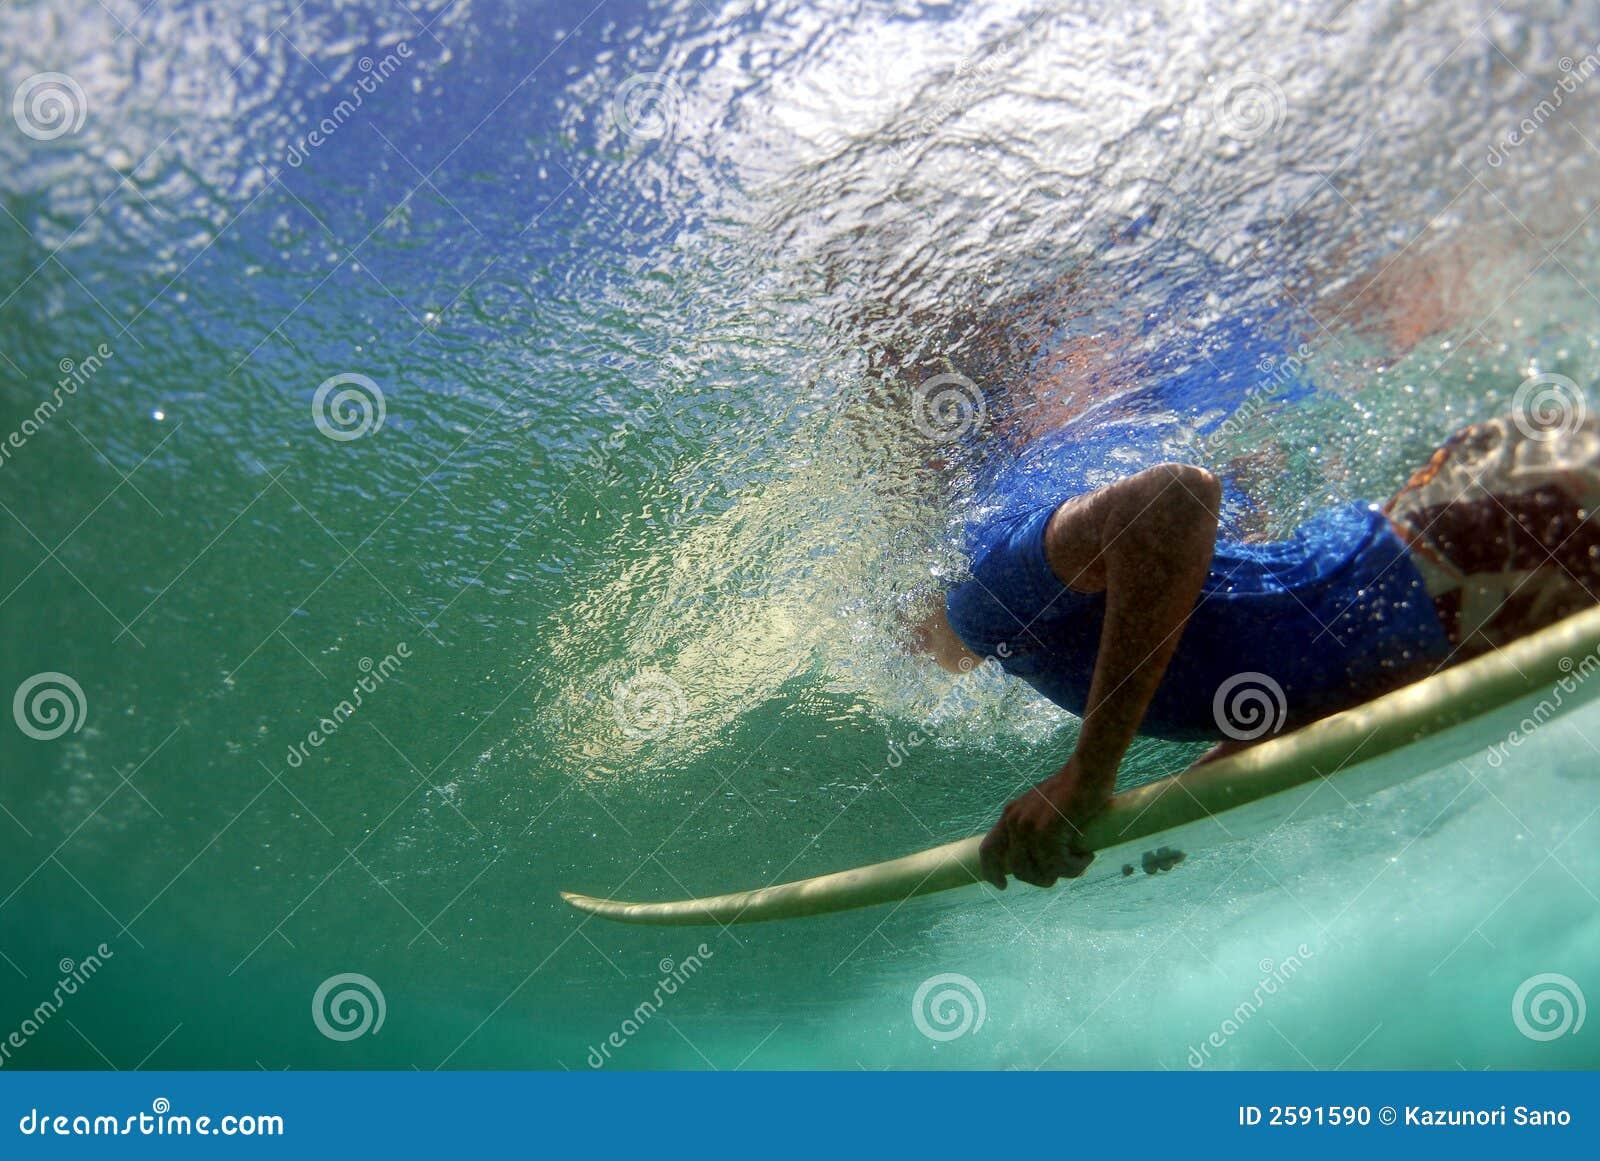 Tiener Surfer Duckdiving